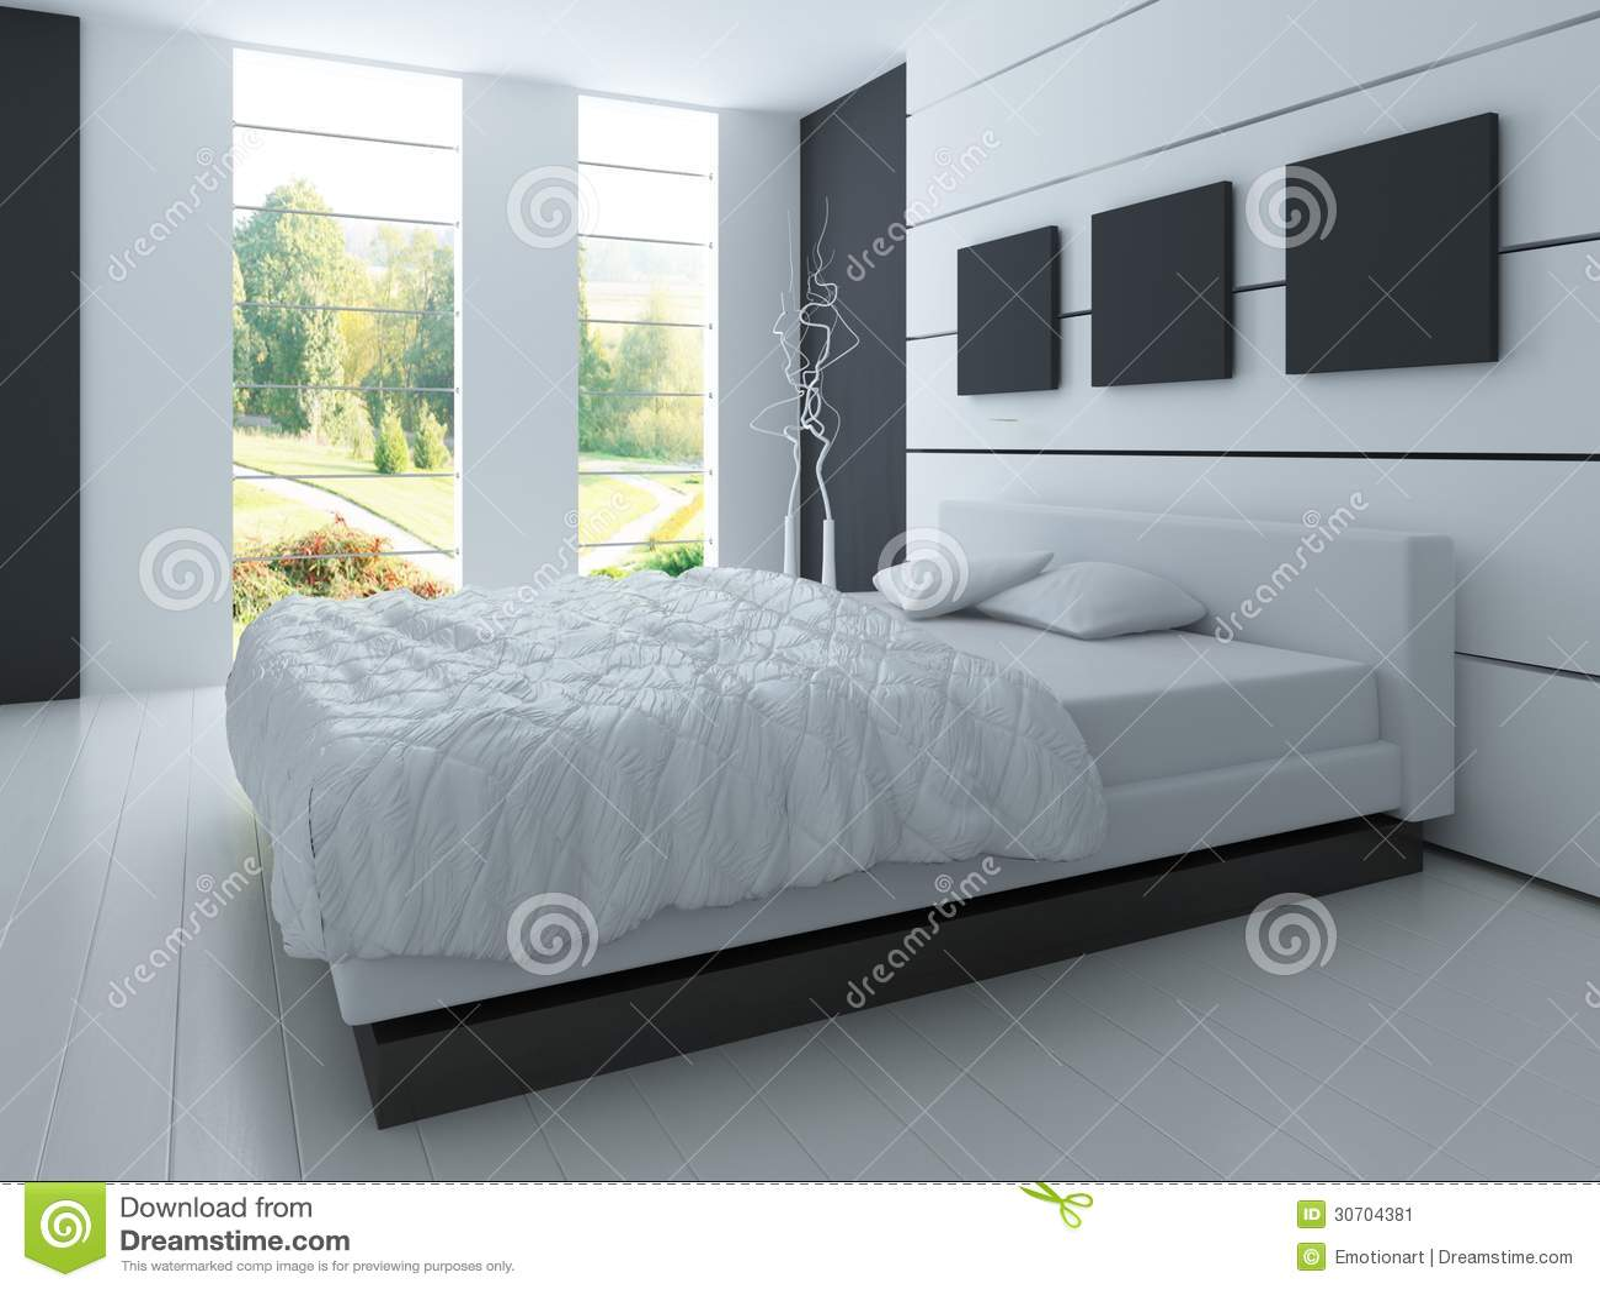 Exclusive design bedroom 3d interior architecture stock for Exclusive bedroom designs